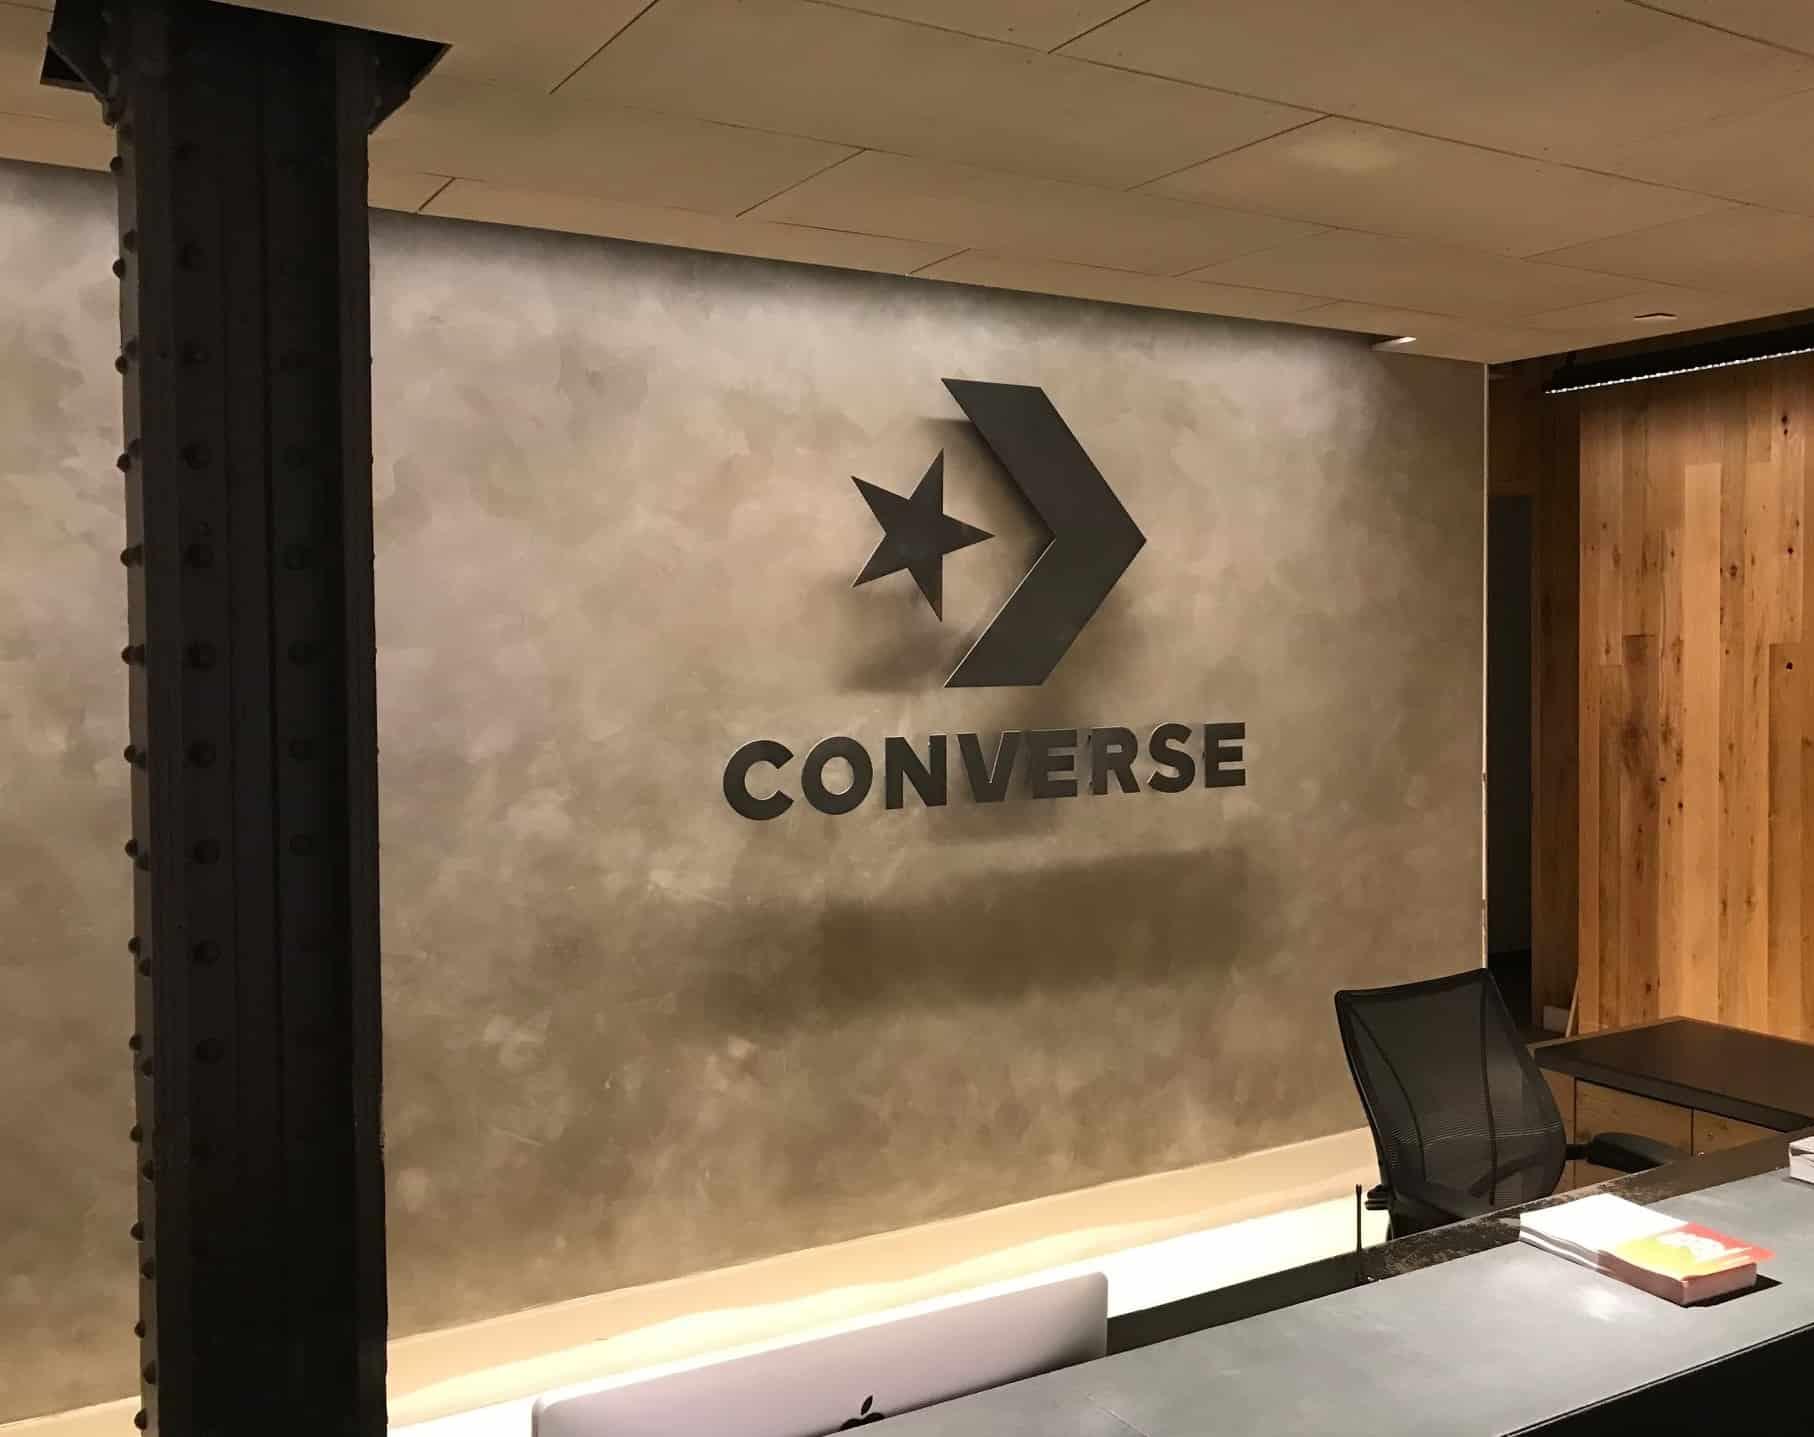 Converse Wall Sign 2